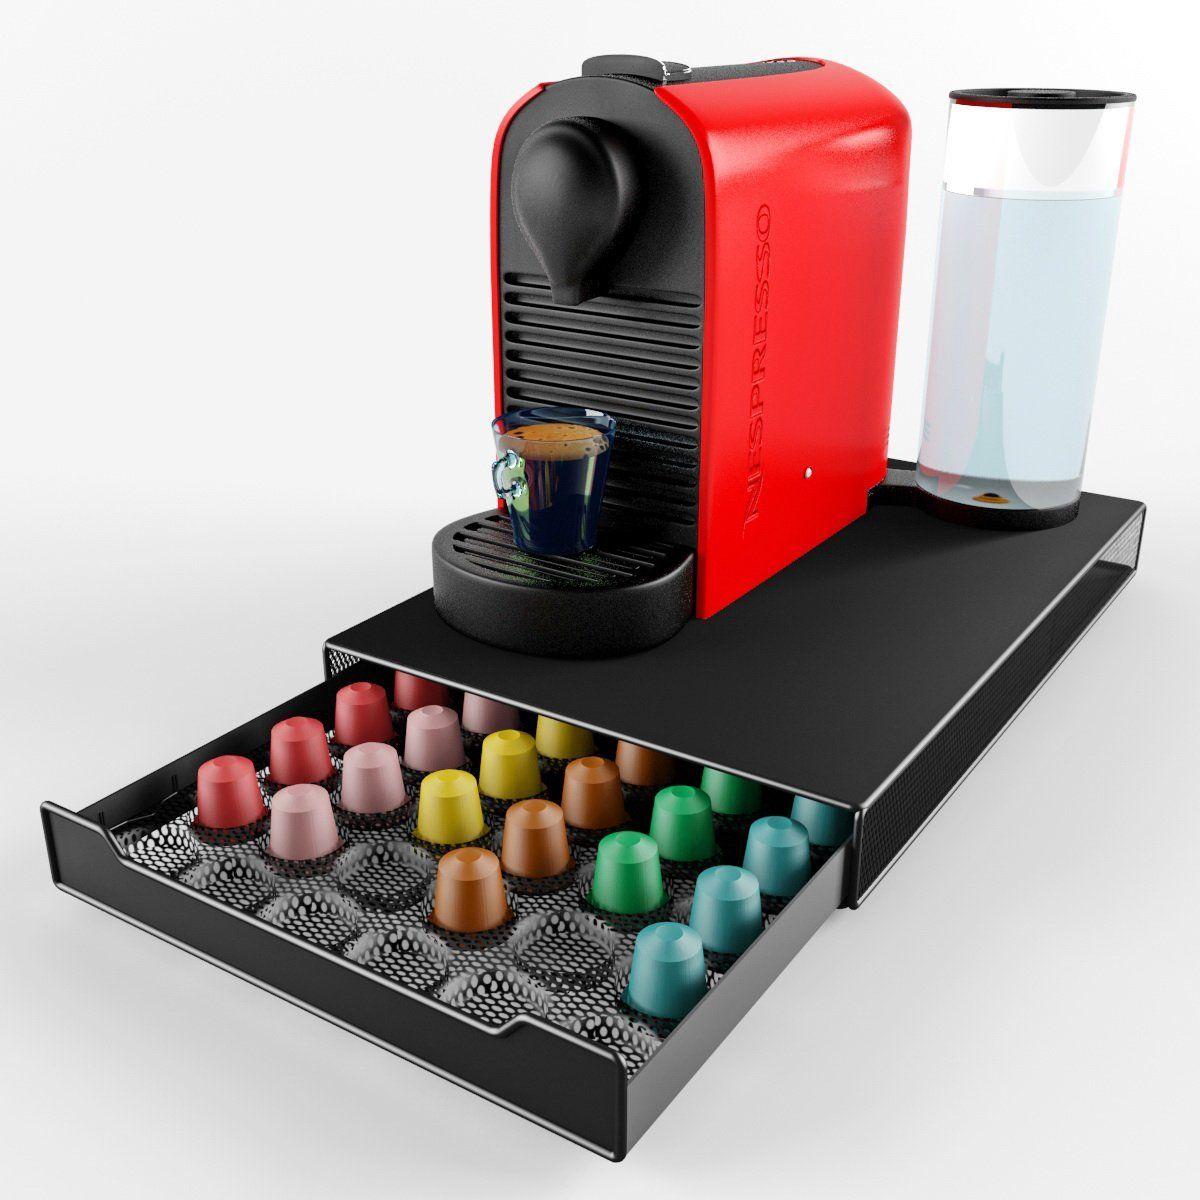 TheCoffeeBox Nespresso Coffee Capsule Holder   Storage Drawer Holds 60  Nespresso Pods